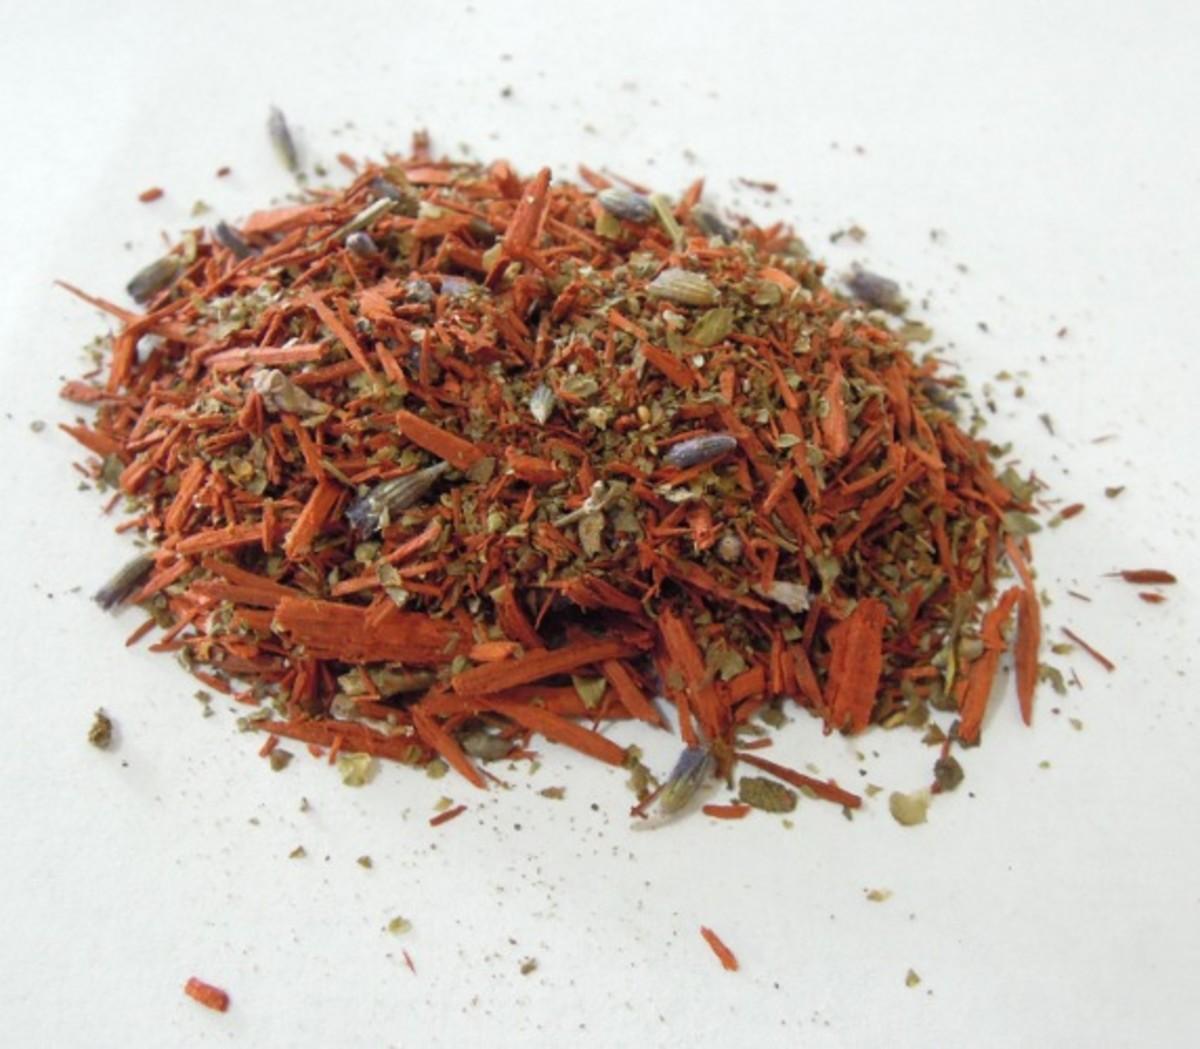 Loose incense blend - Relaxing, made using Sandalwood, Lavender and Marjoram